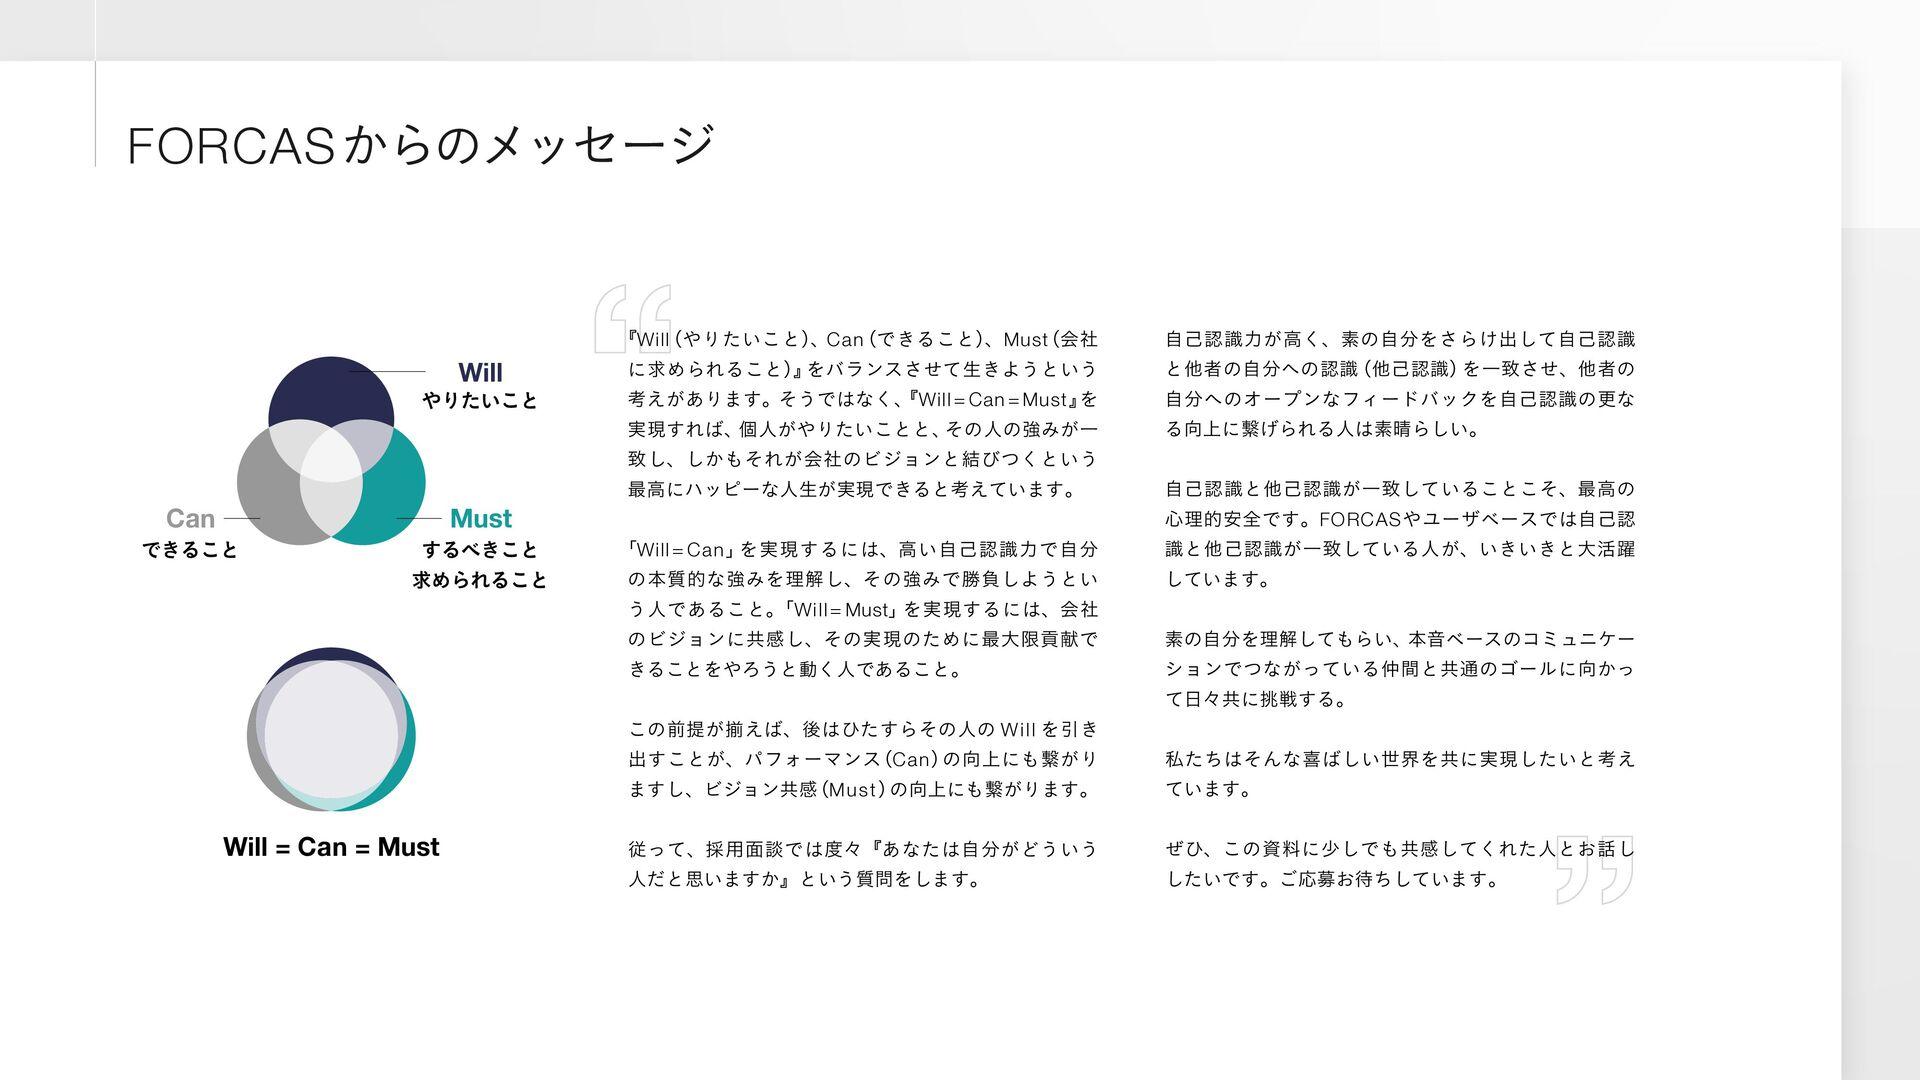 Challenge 03 άϩʔόϧελϯμʔυʹͳΔ ࠷ઌͷηʔϧεˍϚʔέςΟϯάΛ ν...